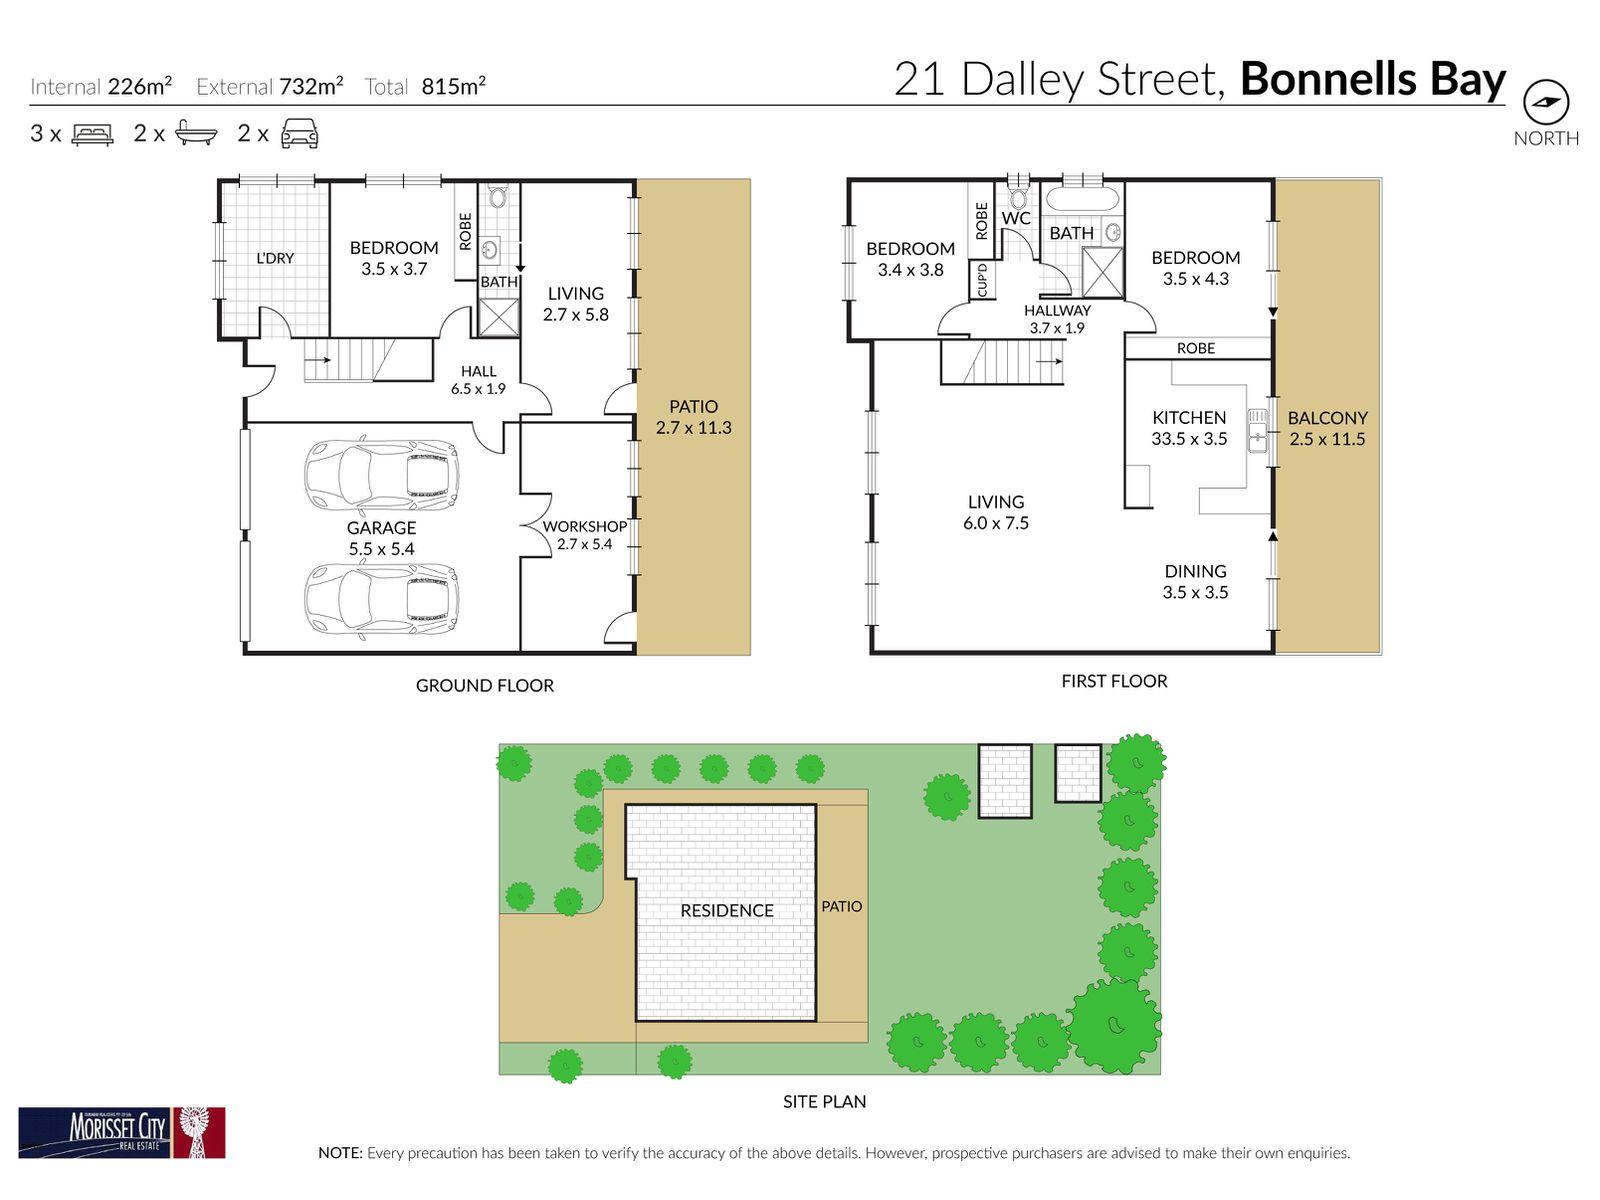 21 Dalley Street, Bonnells Bay